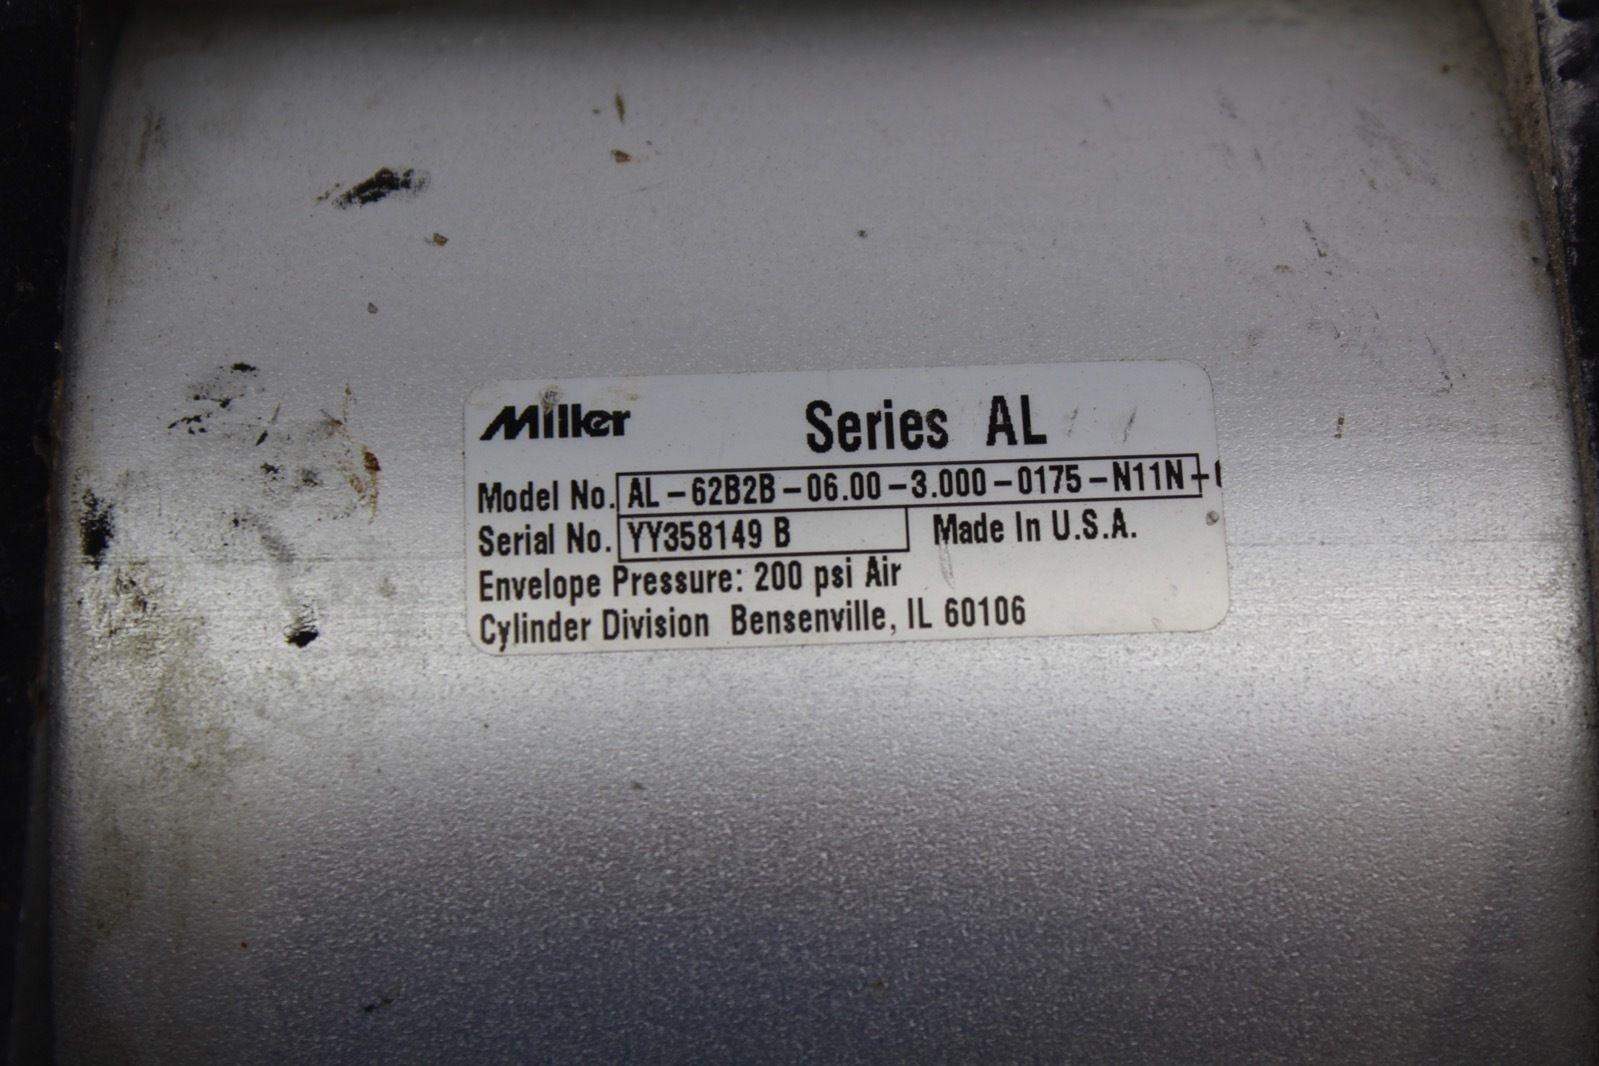 Miller AL-62B2B 6 X 3 X 1